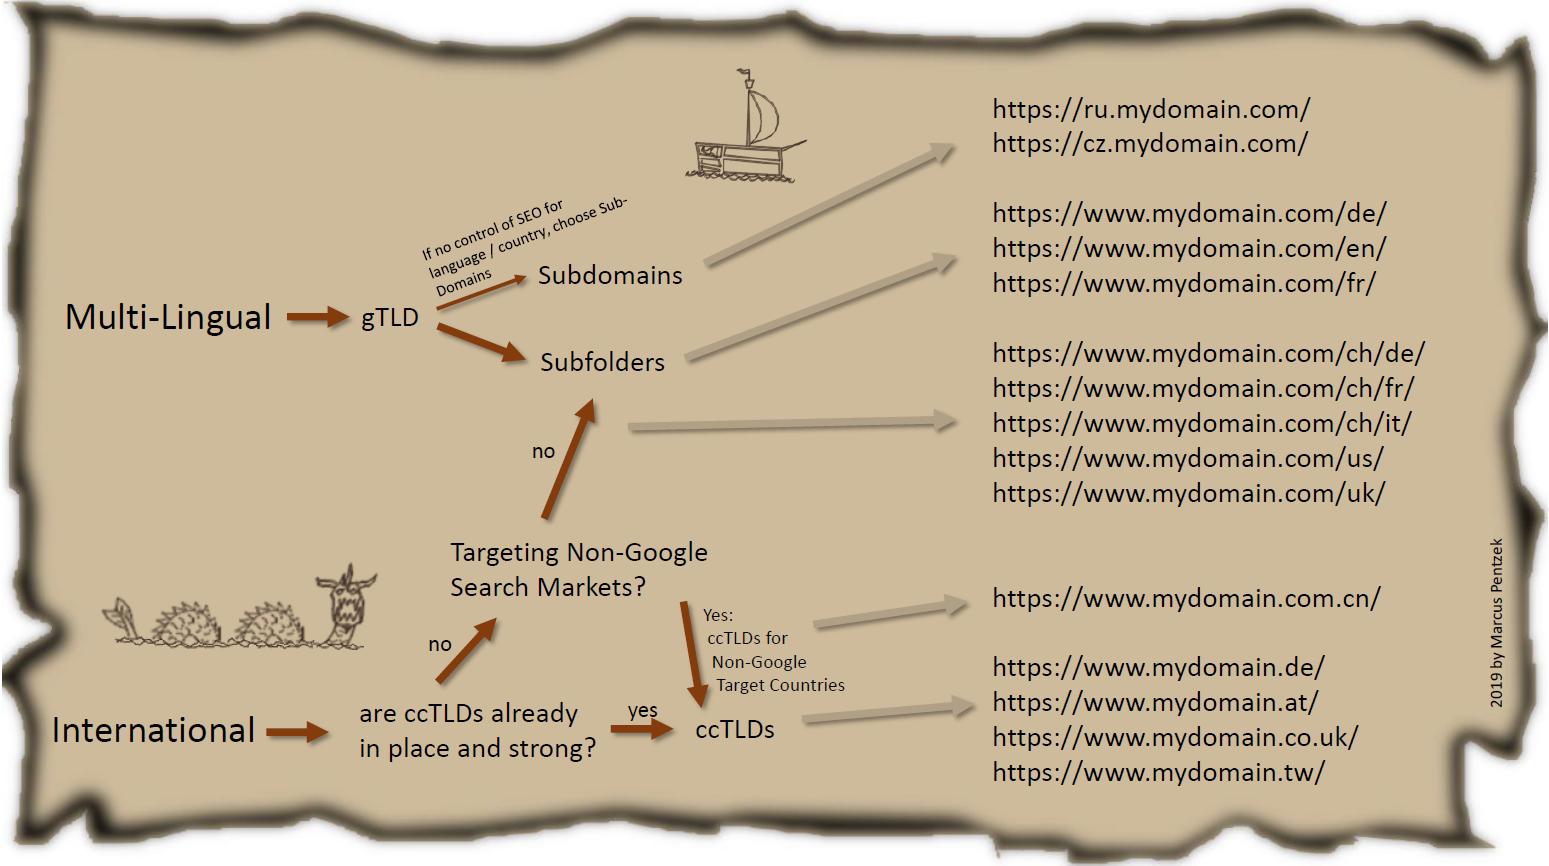 international-seo-tld-decisicion-diagram